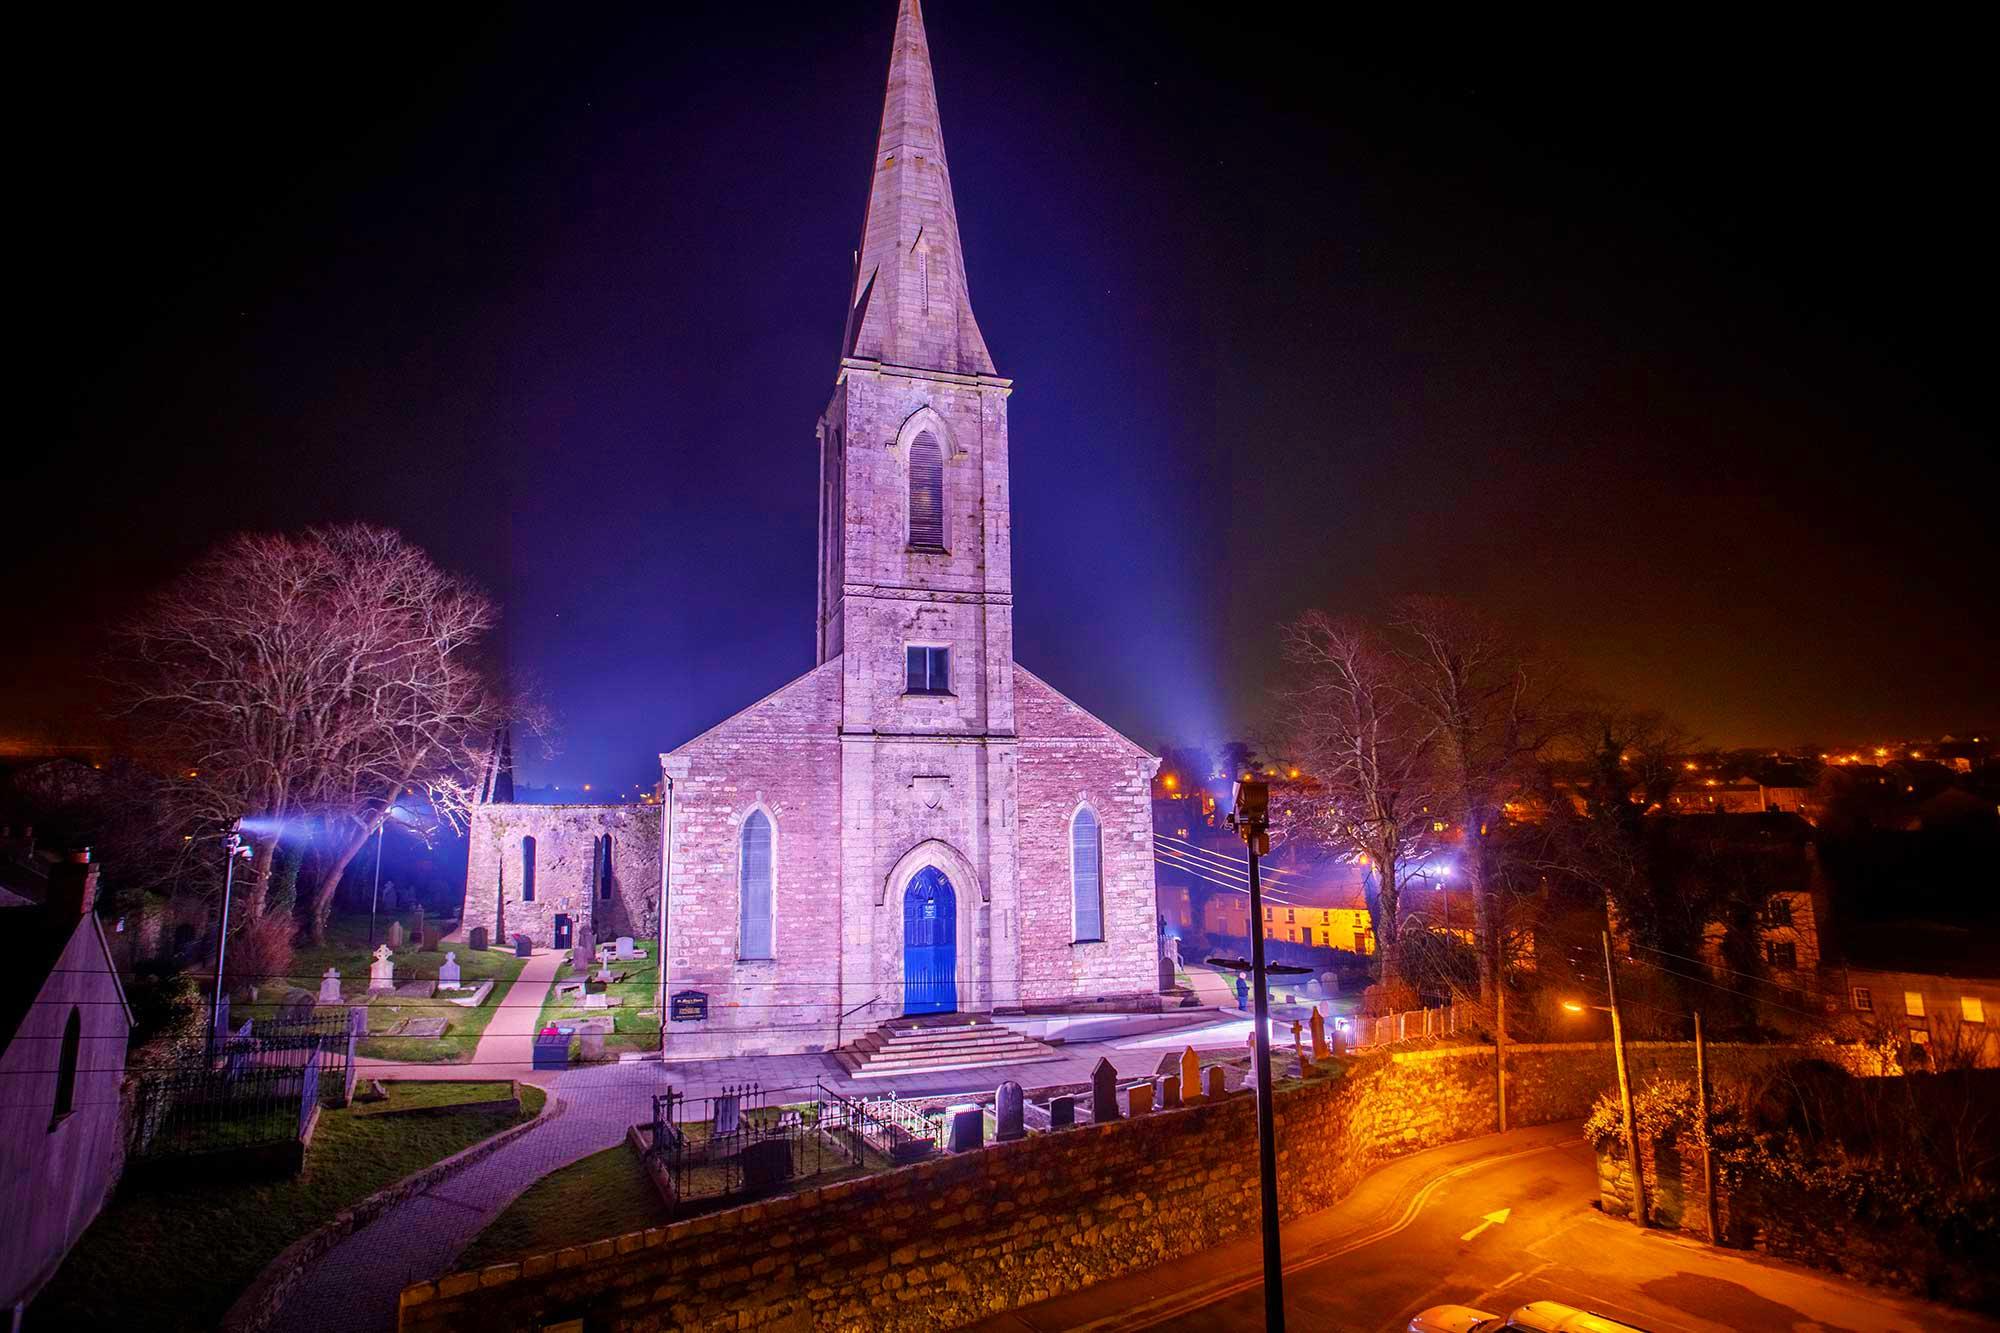 St. Marys, New Ross